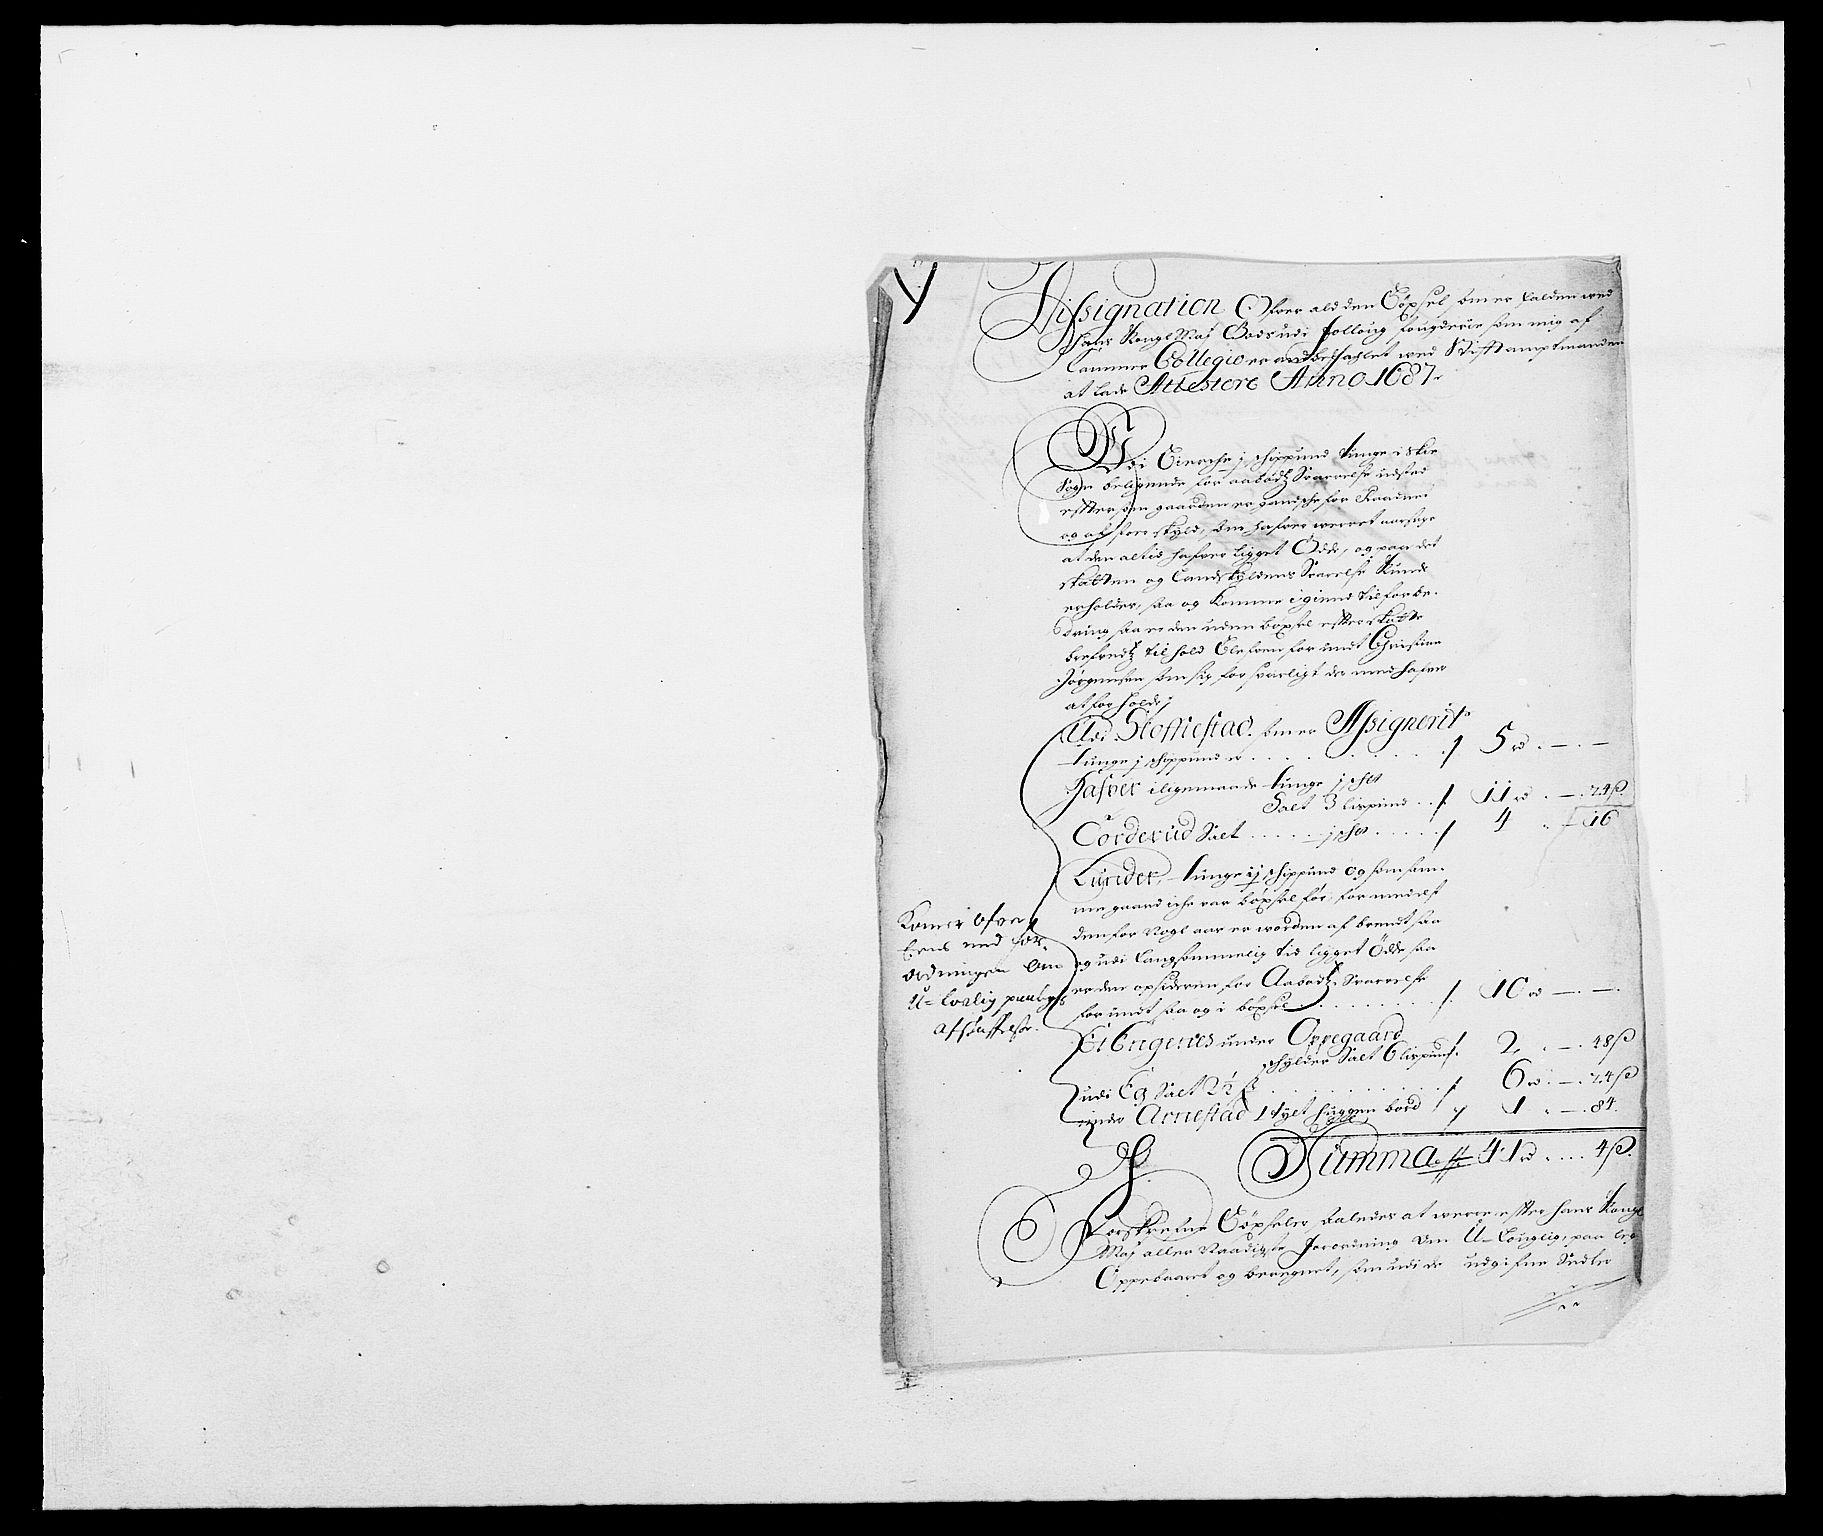 RA, Rentekammeret inntil 1814, Reviderte regnskaper, Fogderegnskap, R09/L0434: Fogderegnskap Follo, 1687-1688, s. 14